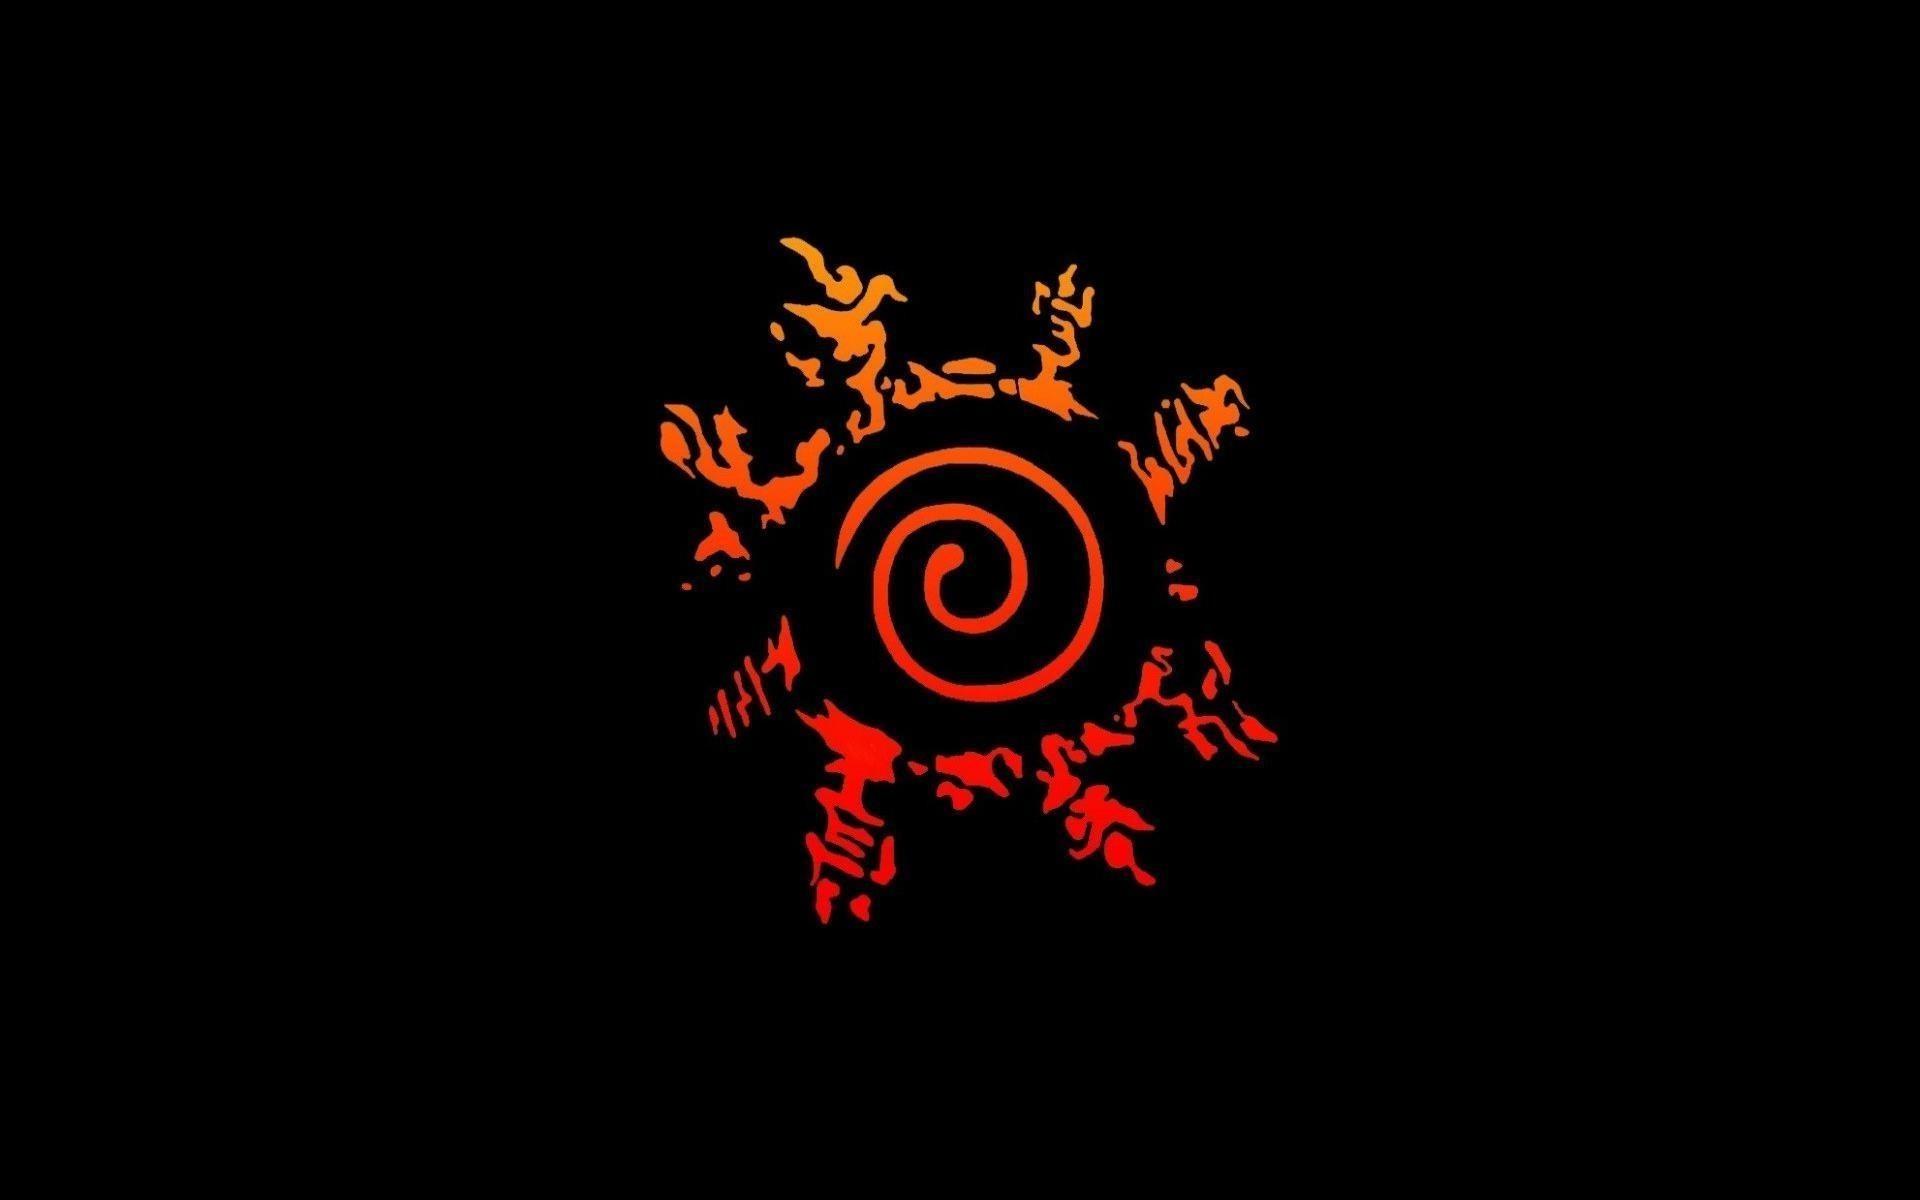 Anime Symbols Wallpaper 77 images